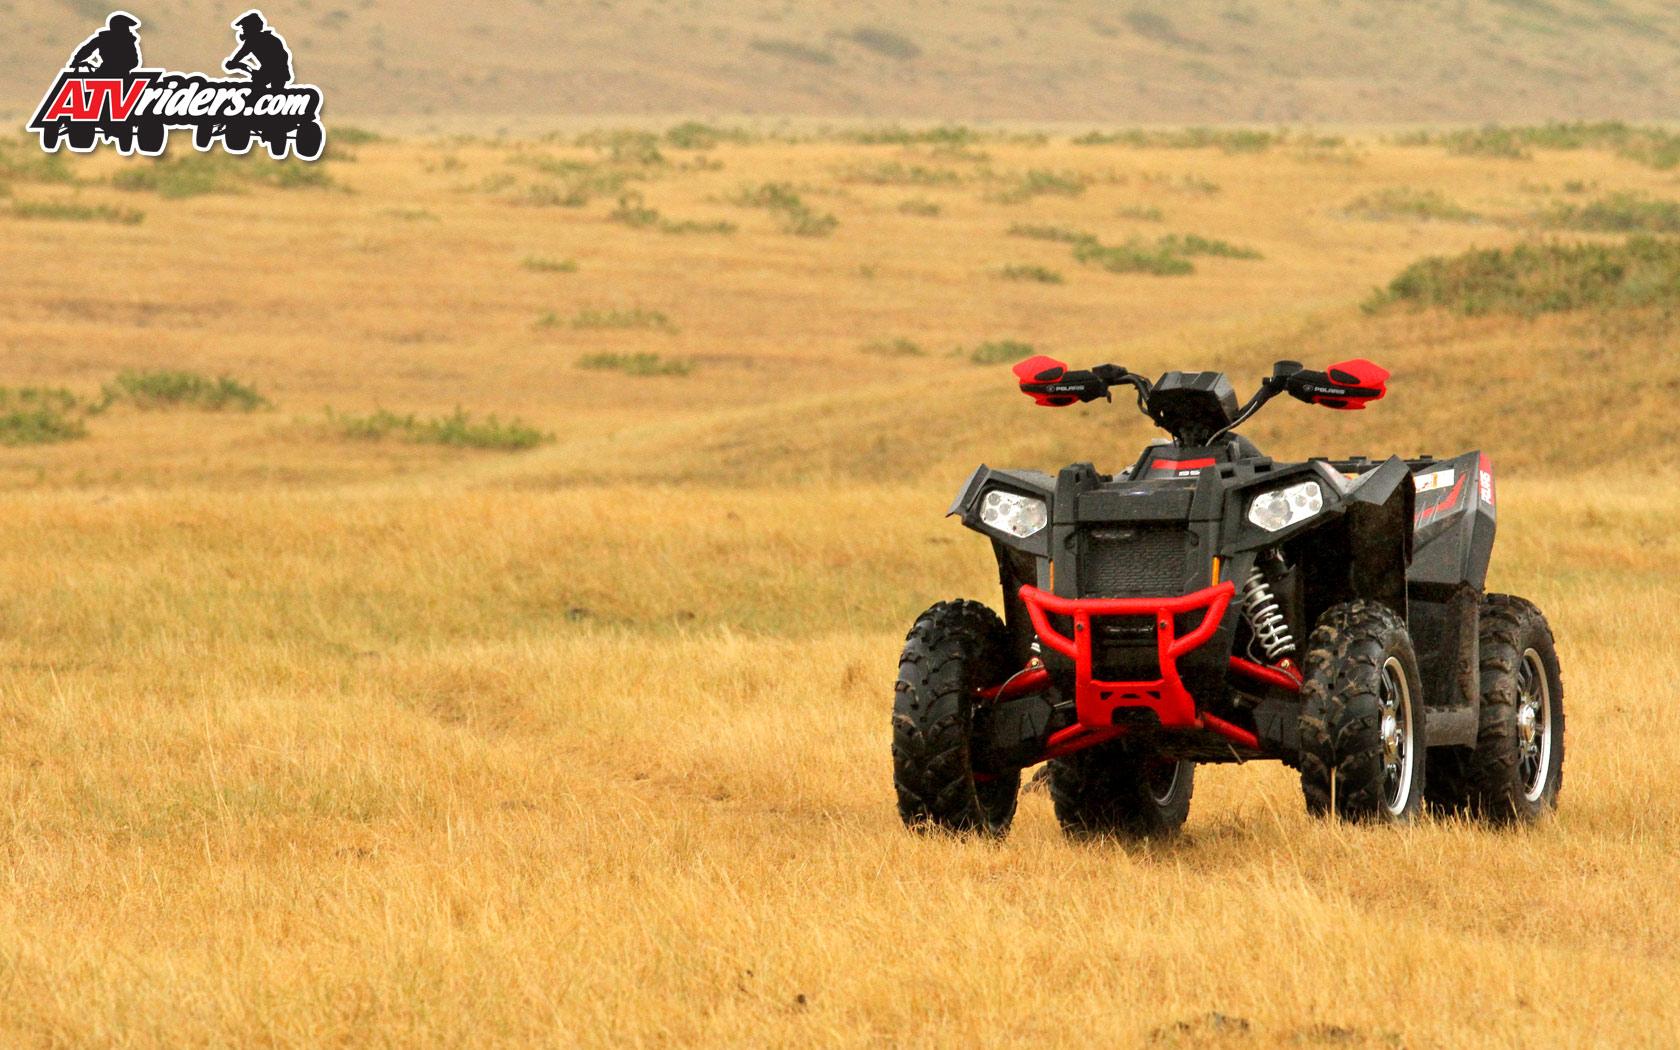 2013 Polaris Scrambler XP 850 4x4 EFI ATV   Great Falls MT 1680x1050